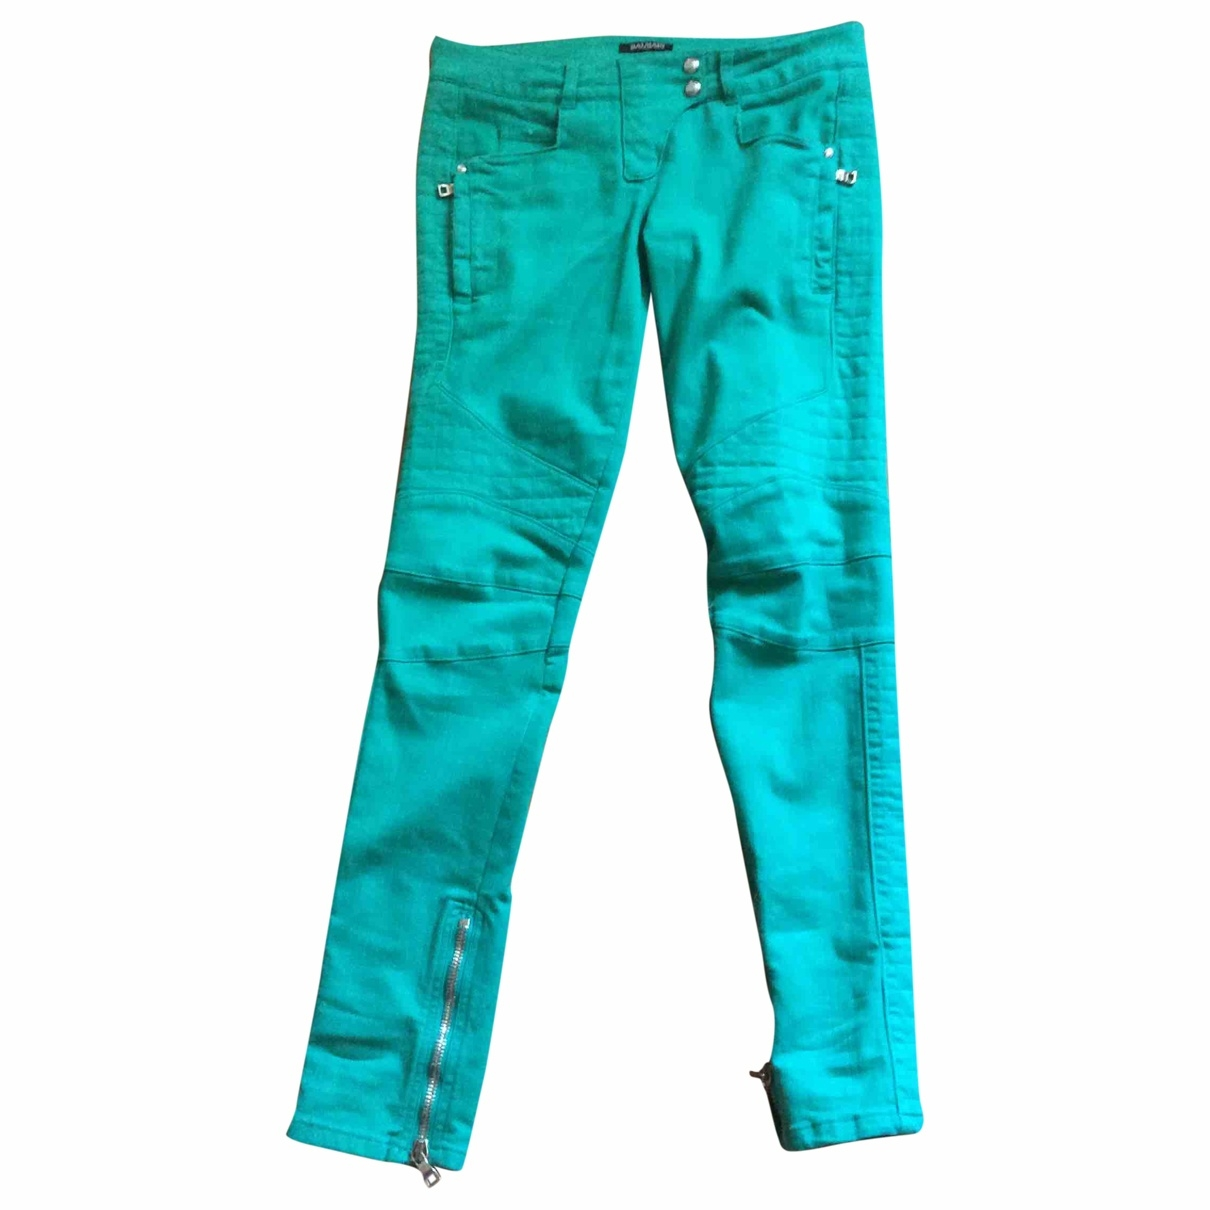 Balmain \N Green Denim - Jeans Trousers for Women L International